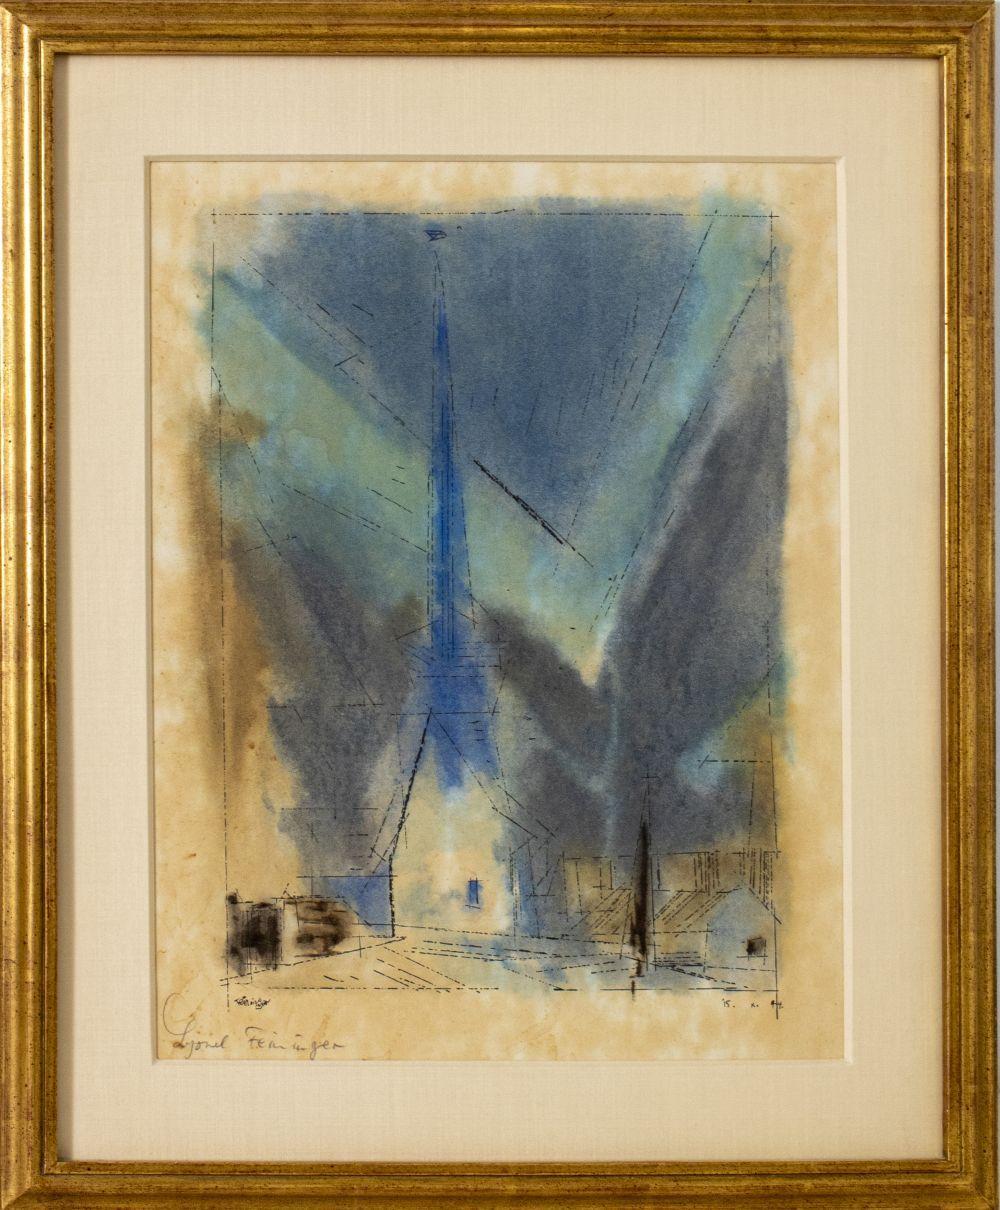 Lyonel Feininger Spire of Gelmeroda Lithograph